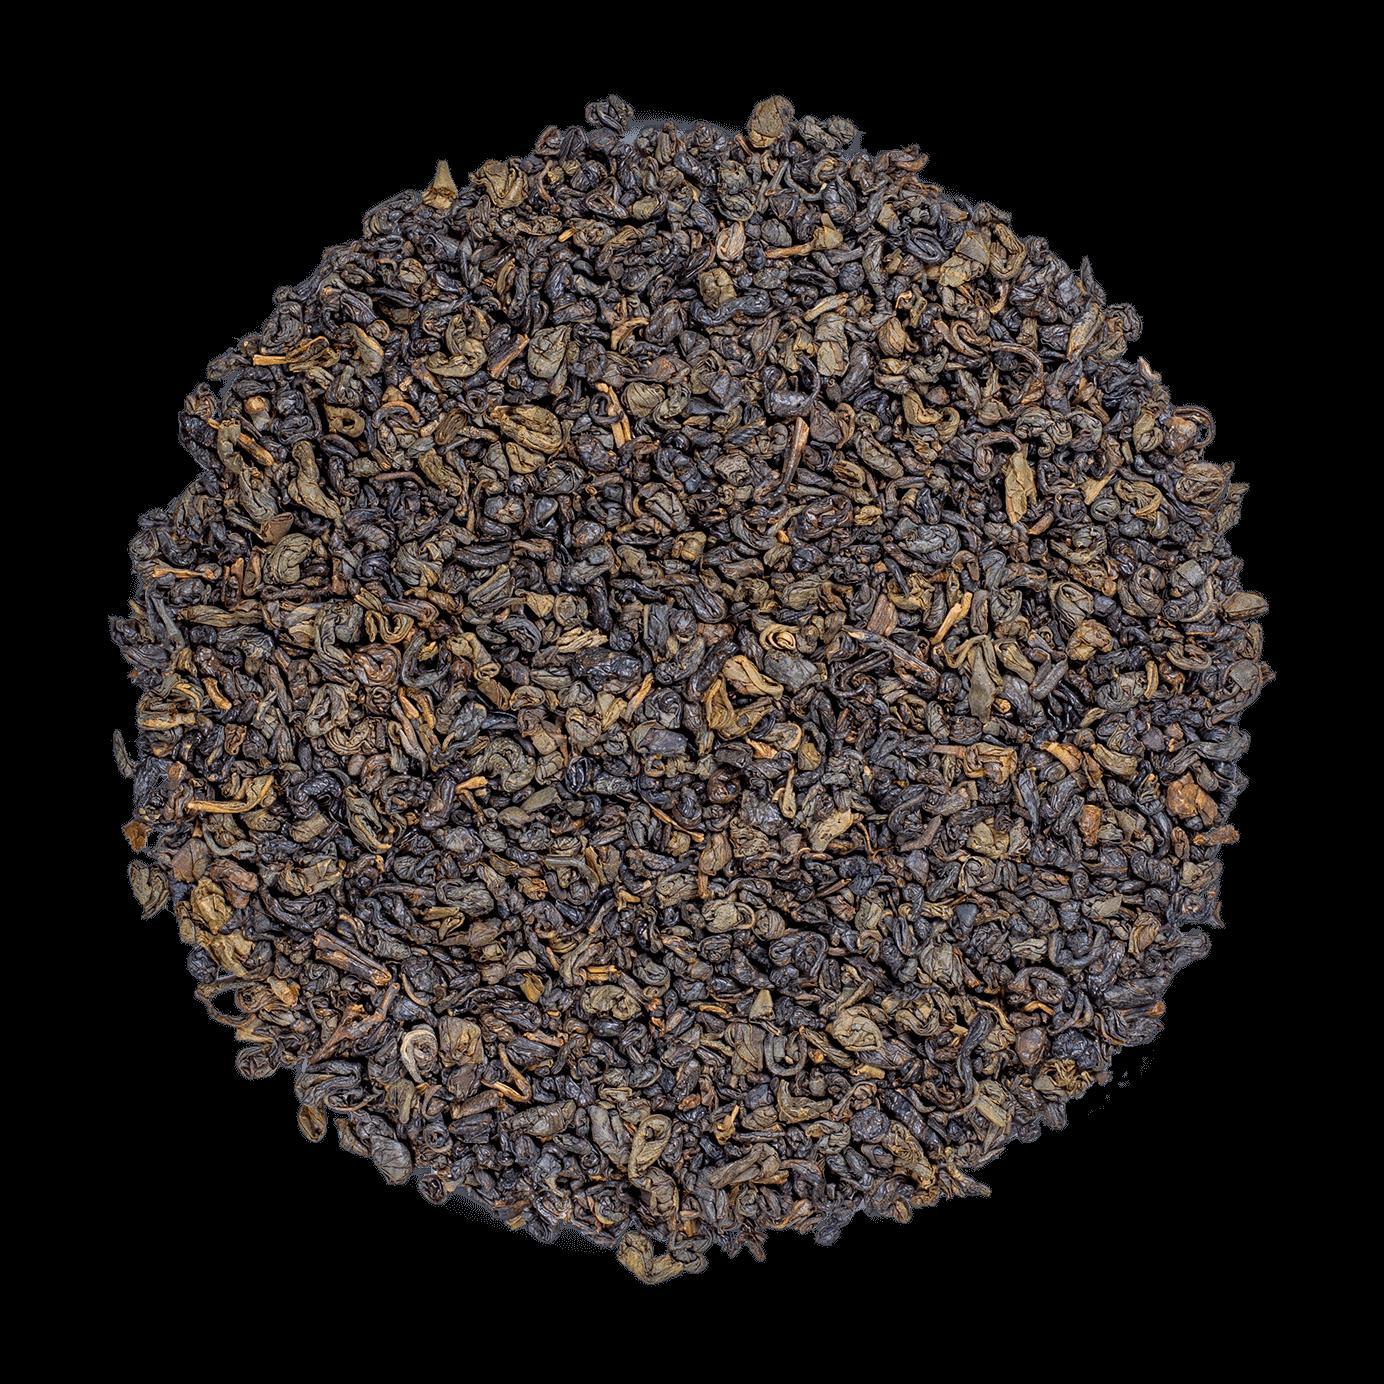 Thé vert Gunpowder bio - Thé vert de Chine - Thé en vrac - Kusmi Tea